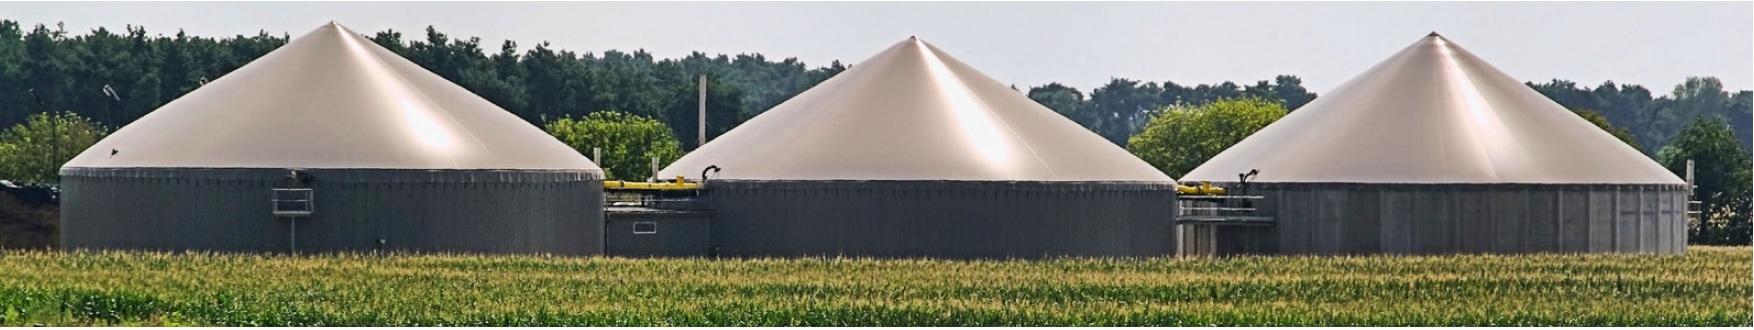 Biogas_contropost